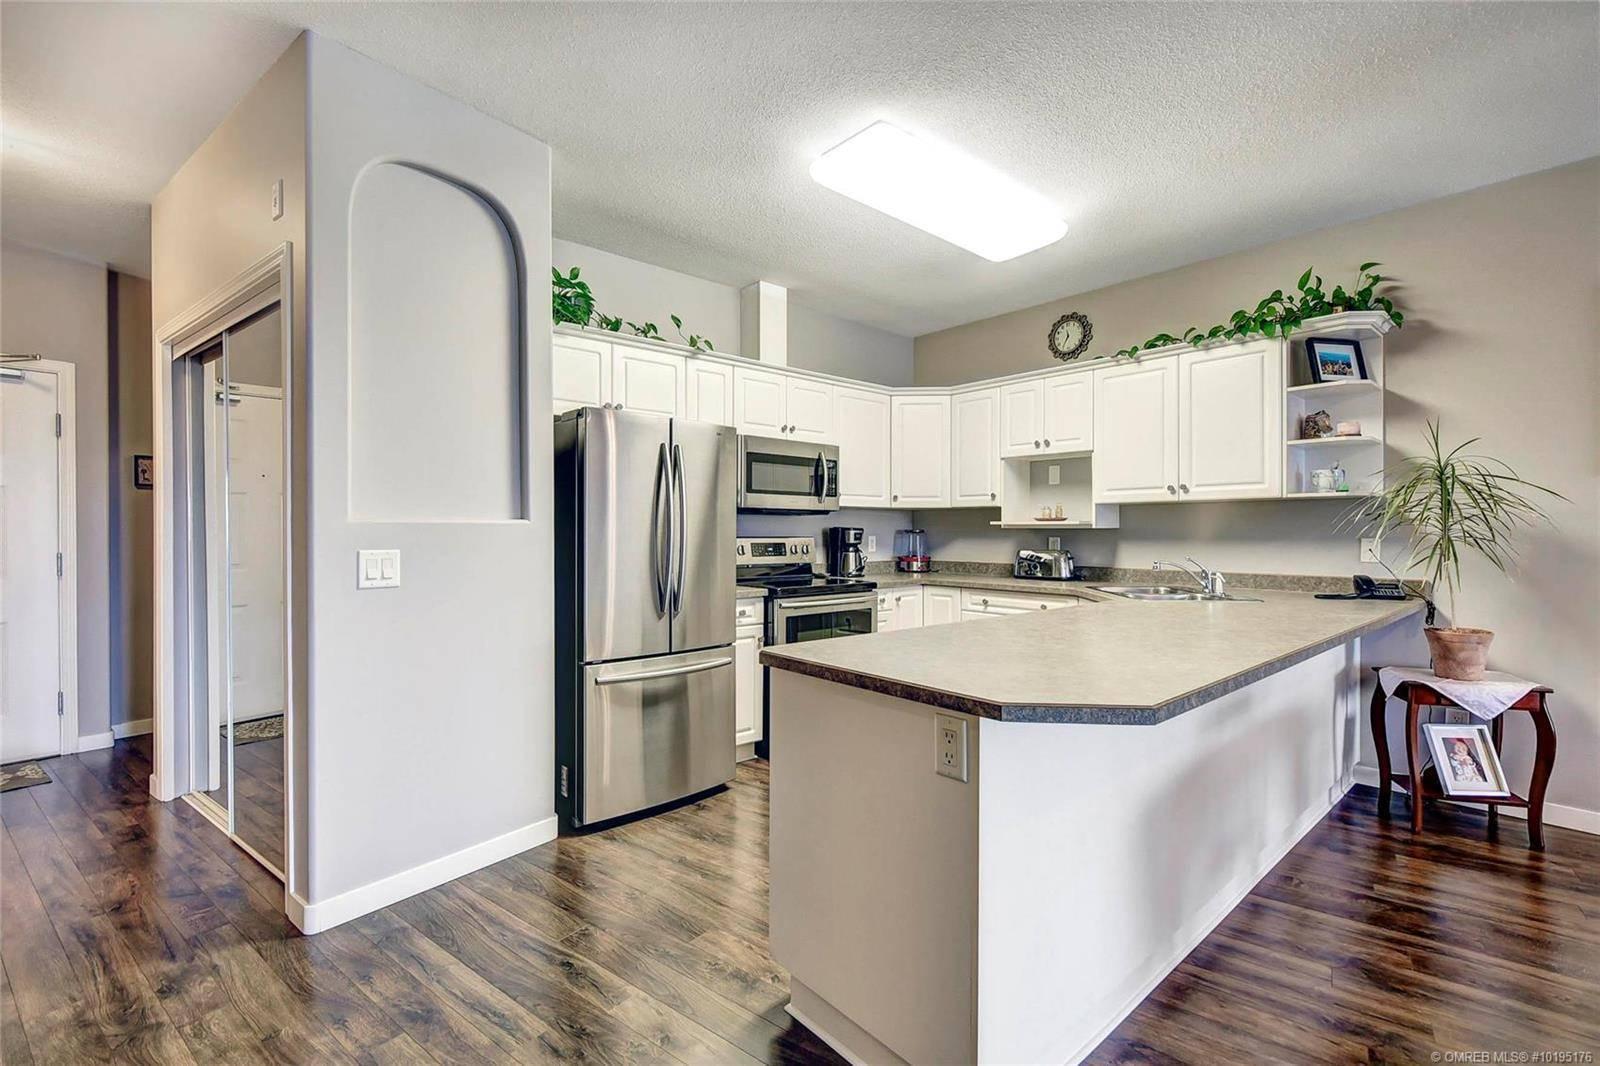 Condo for sale at 2300 Benvoulin Rd Unit 205 Kelowna British Columbia - MLS: 10195176